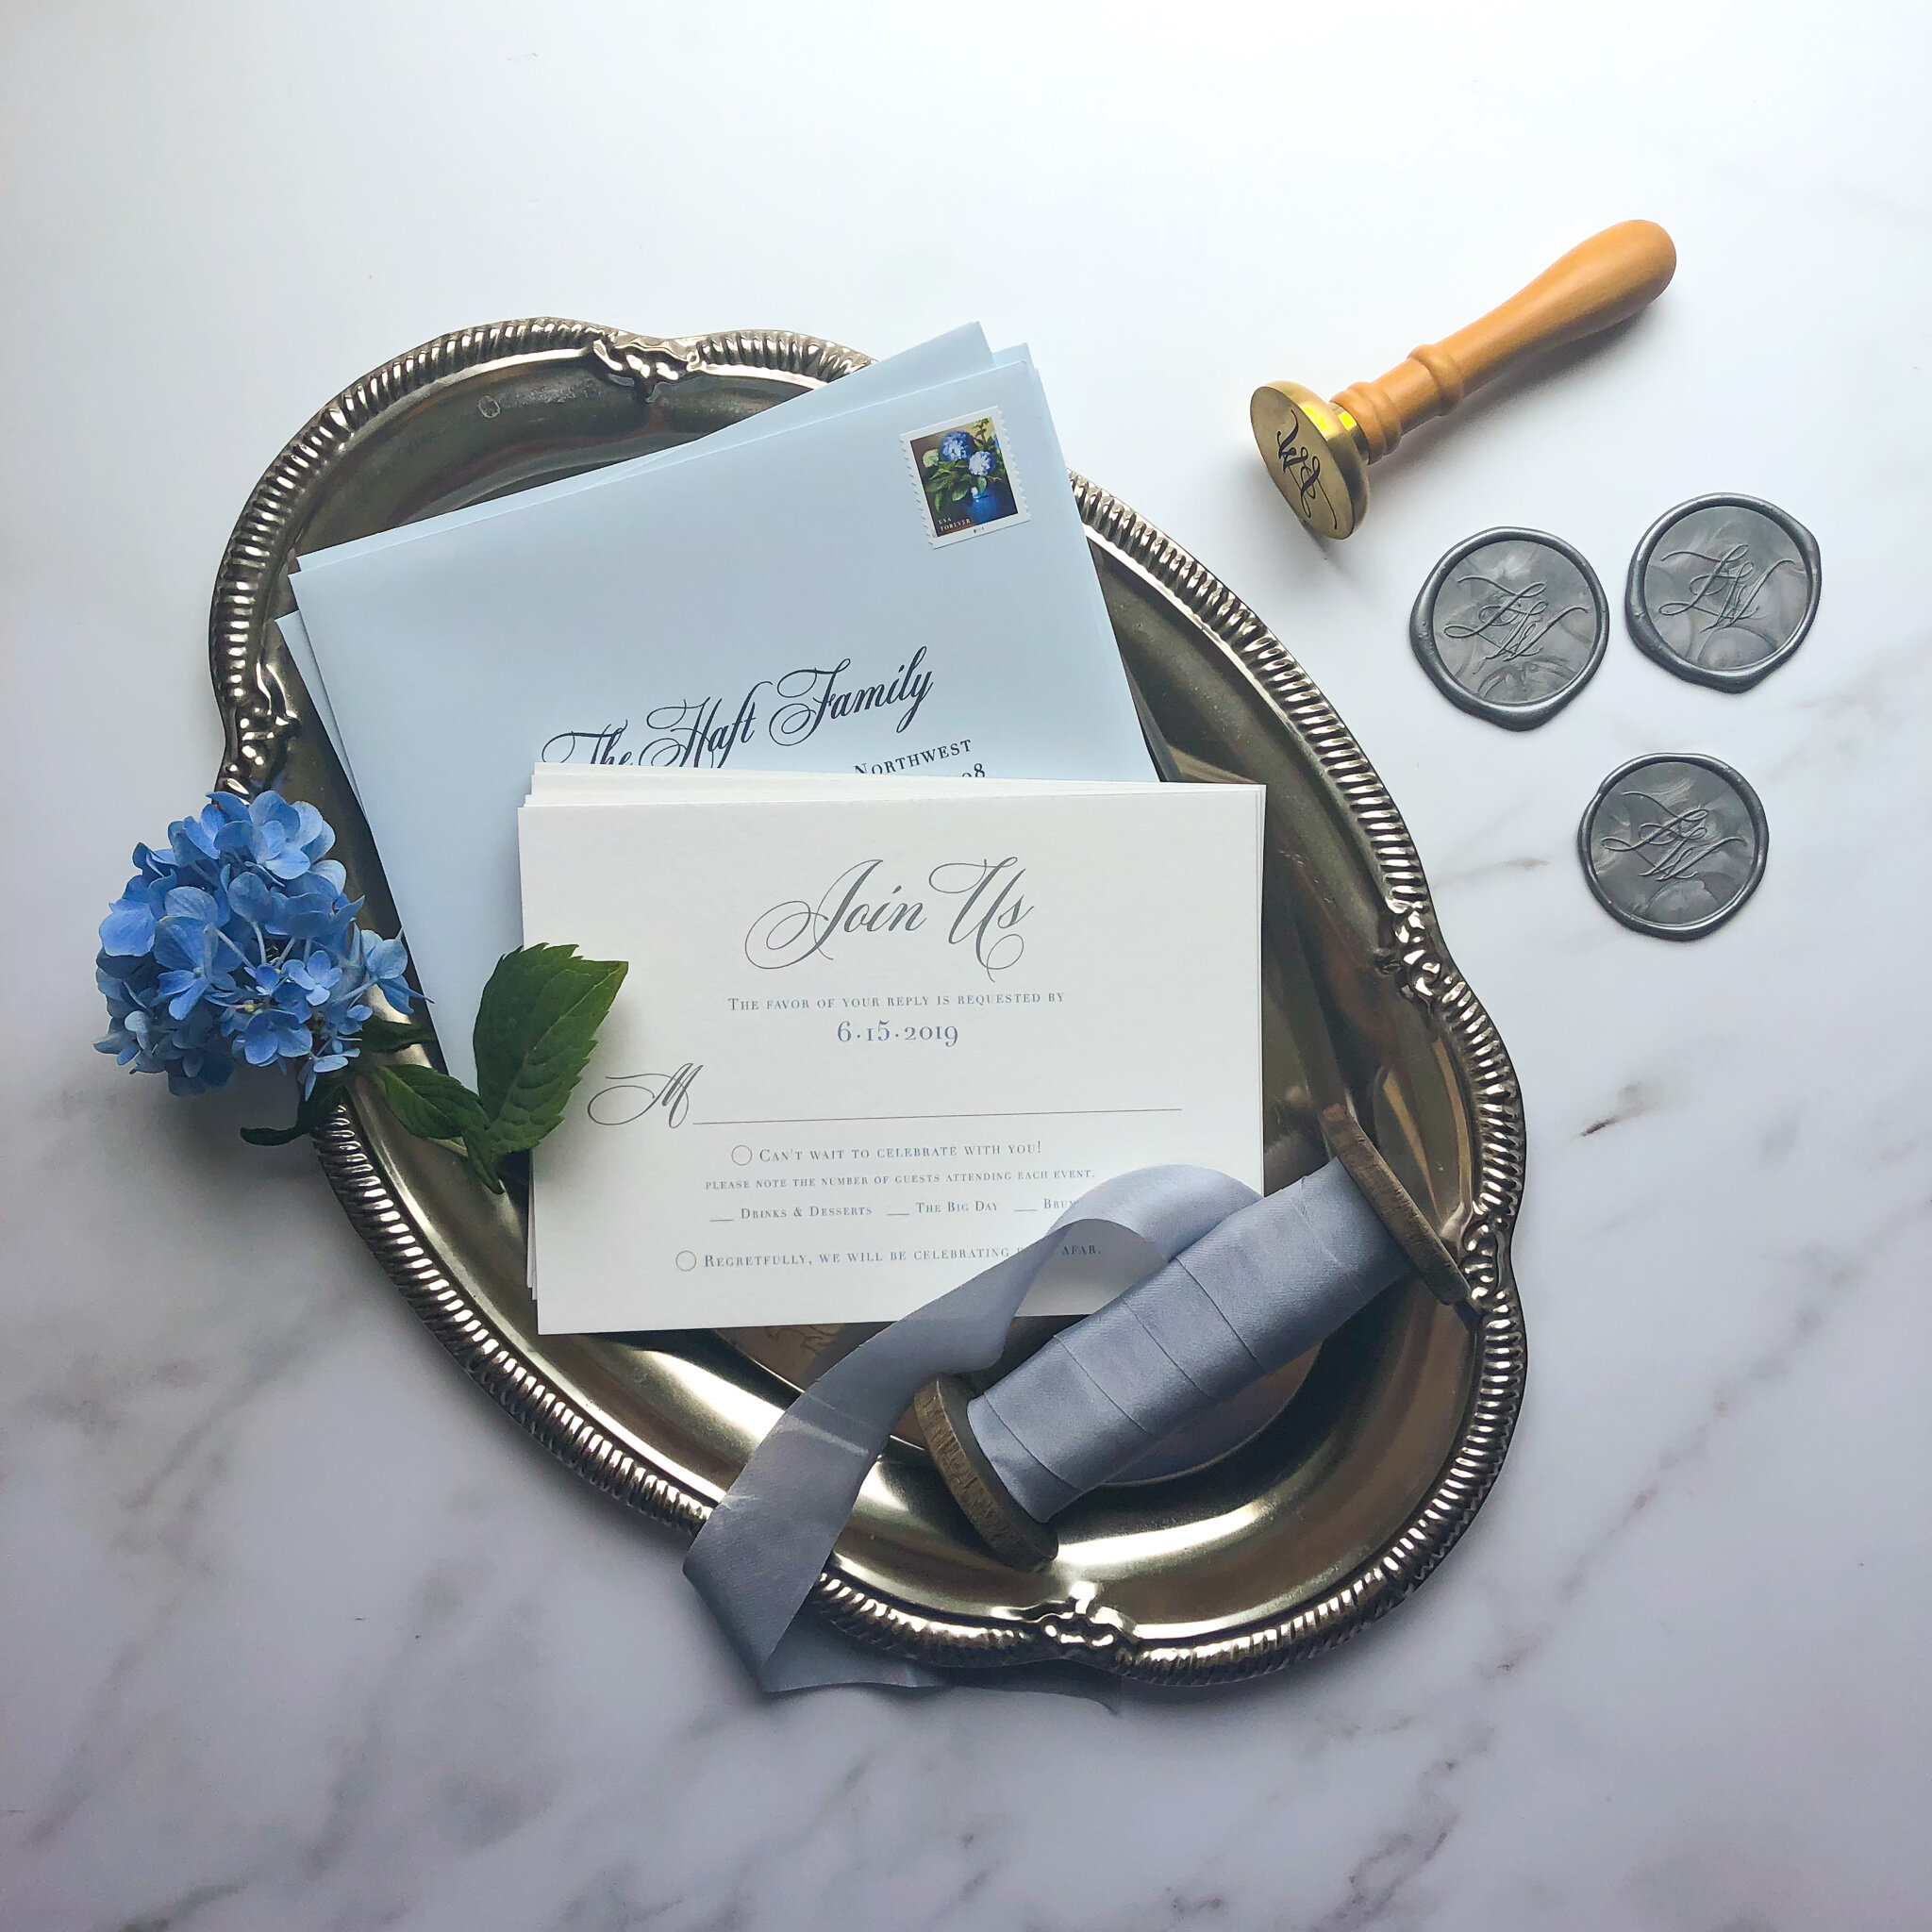 TypeAInvitations_Nantucket_SilverBlue_Wedding_RSVPcards_DigitalAddressing.jpg